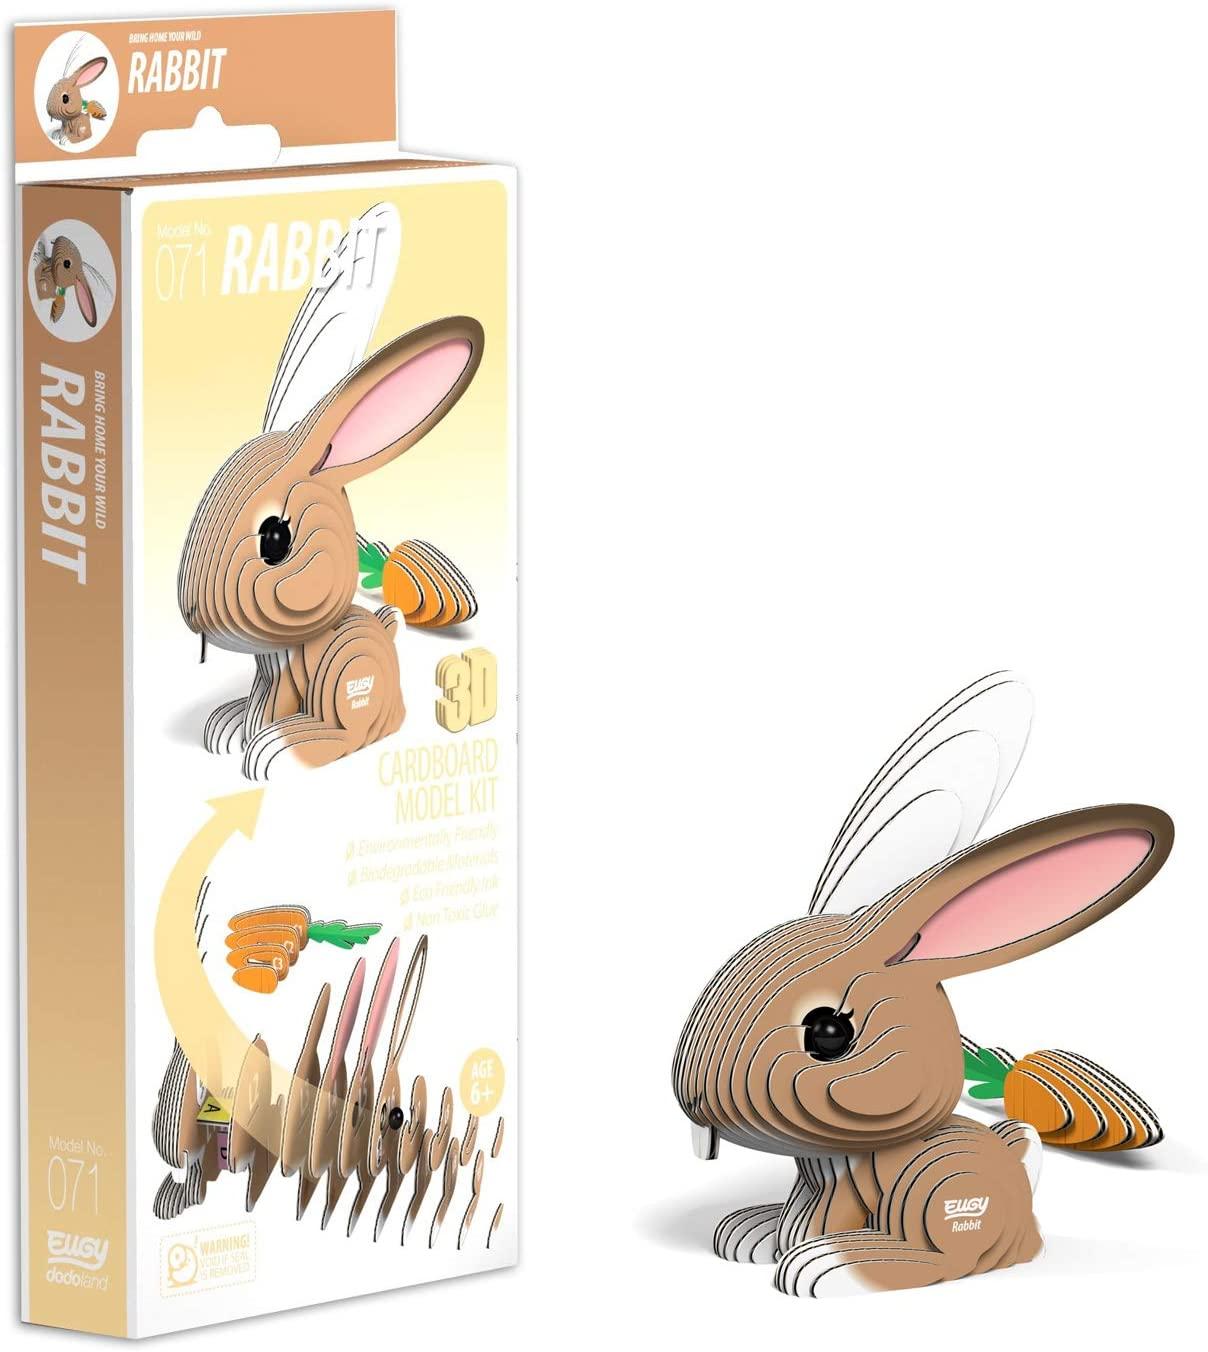 EUGY Rabbit 3D Craft Kit